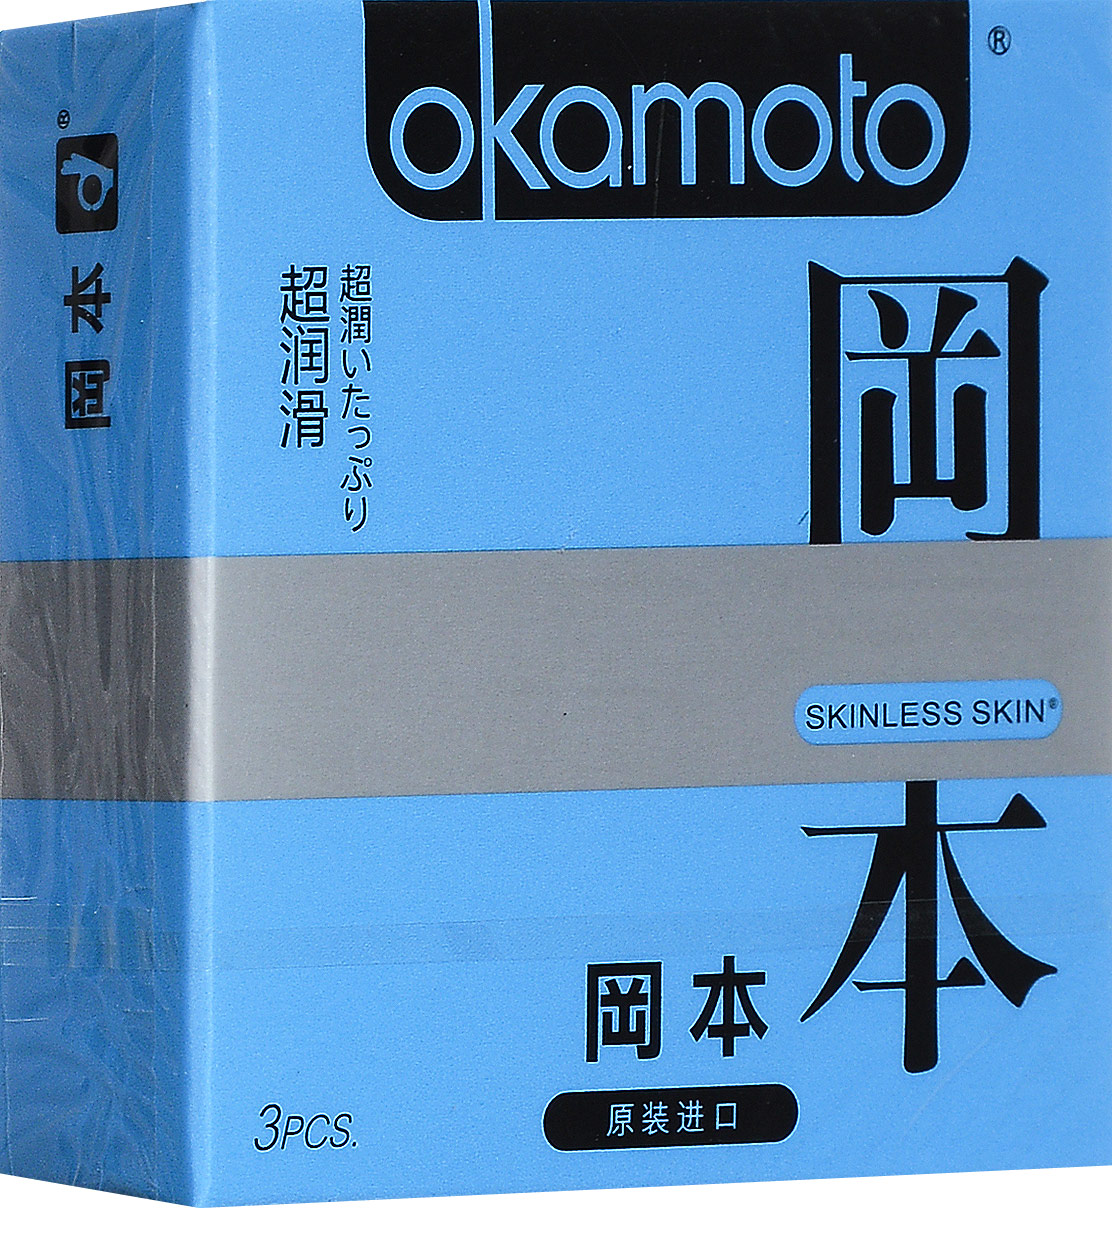 Презервативы Okamоto Skinless Skin Super Lubricative 3 шт c обильной смазкой5010777139655Презервативы Okamоto Skinless Skin Super Lubricative 3 шт c обильной смазкой